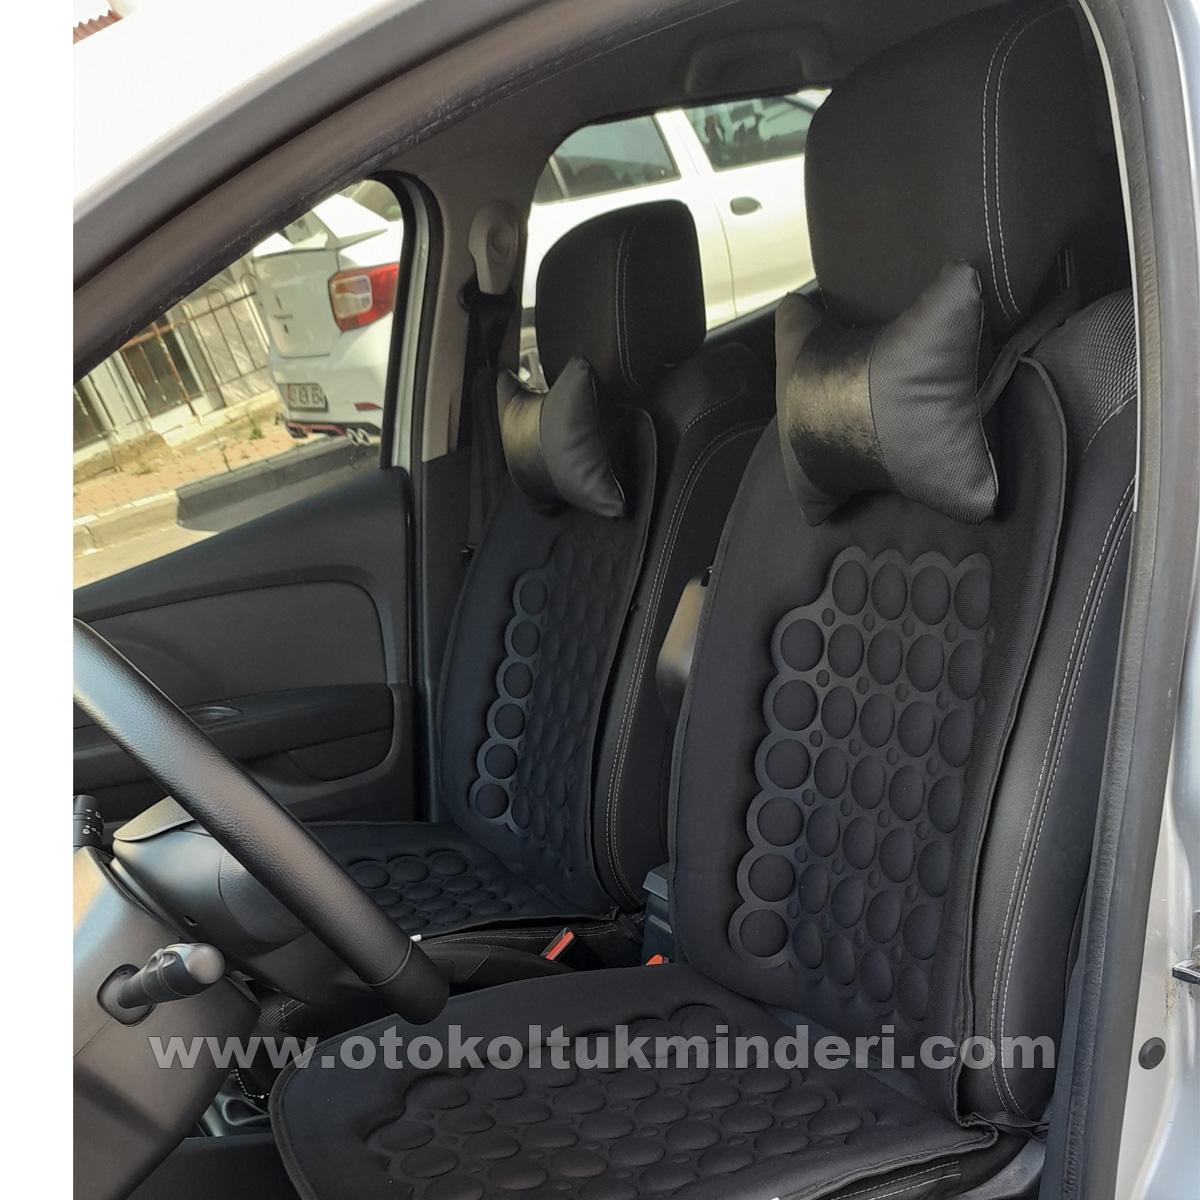 Jeep koltuk minderi